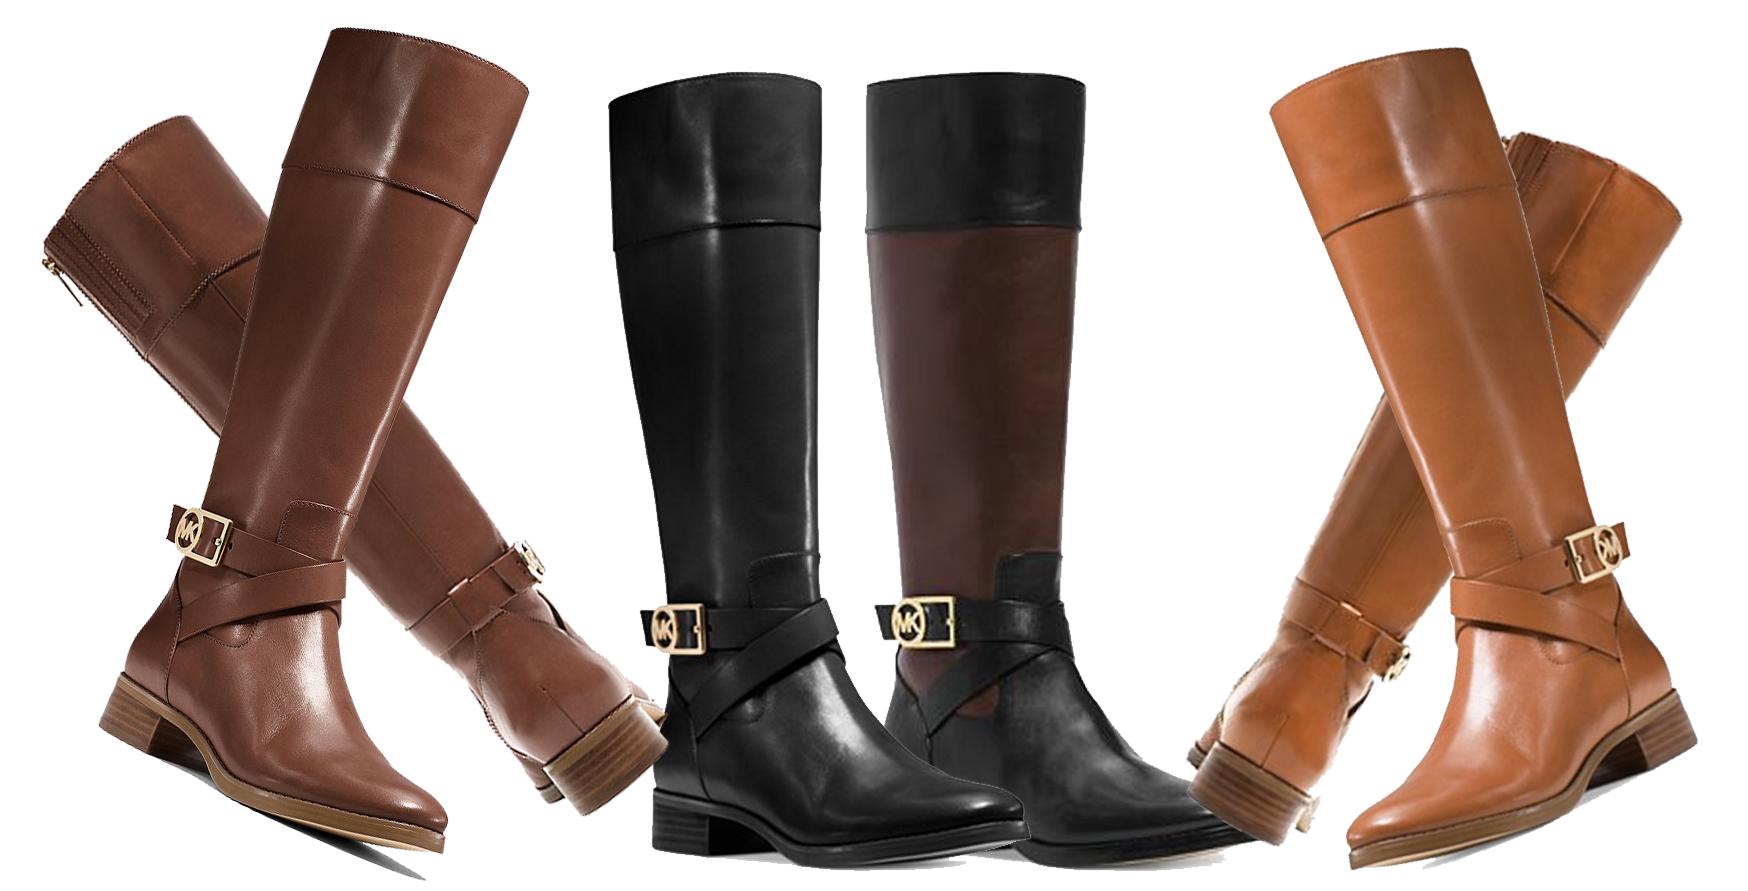 b6b648f2a2b9 Top picks  Michael Michael Kors knee high boots - My Fashion Wants